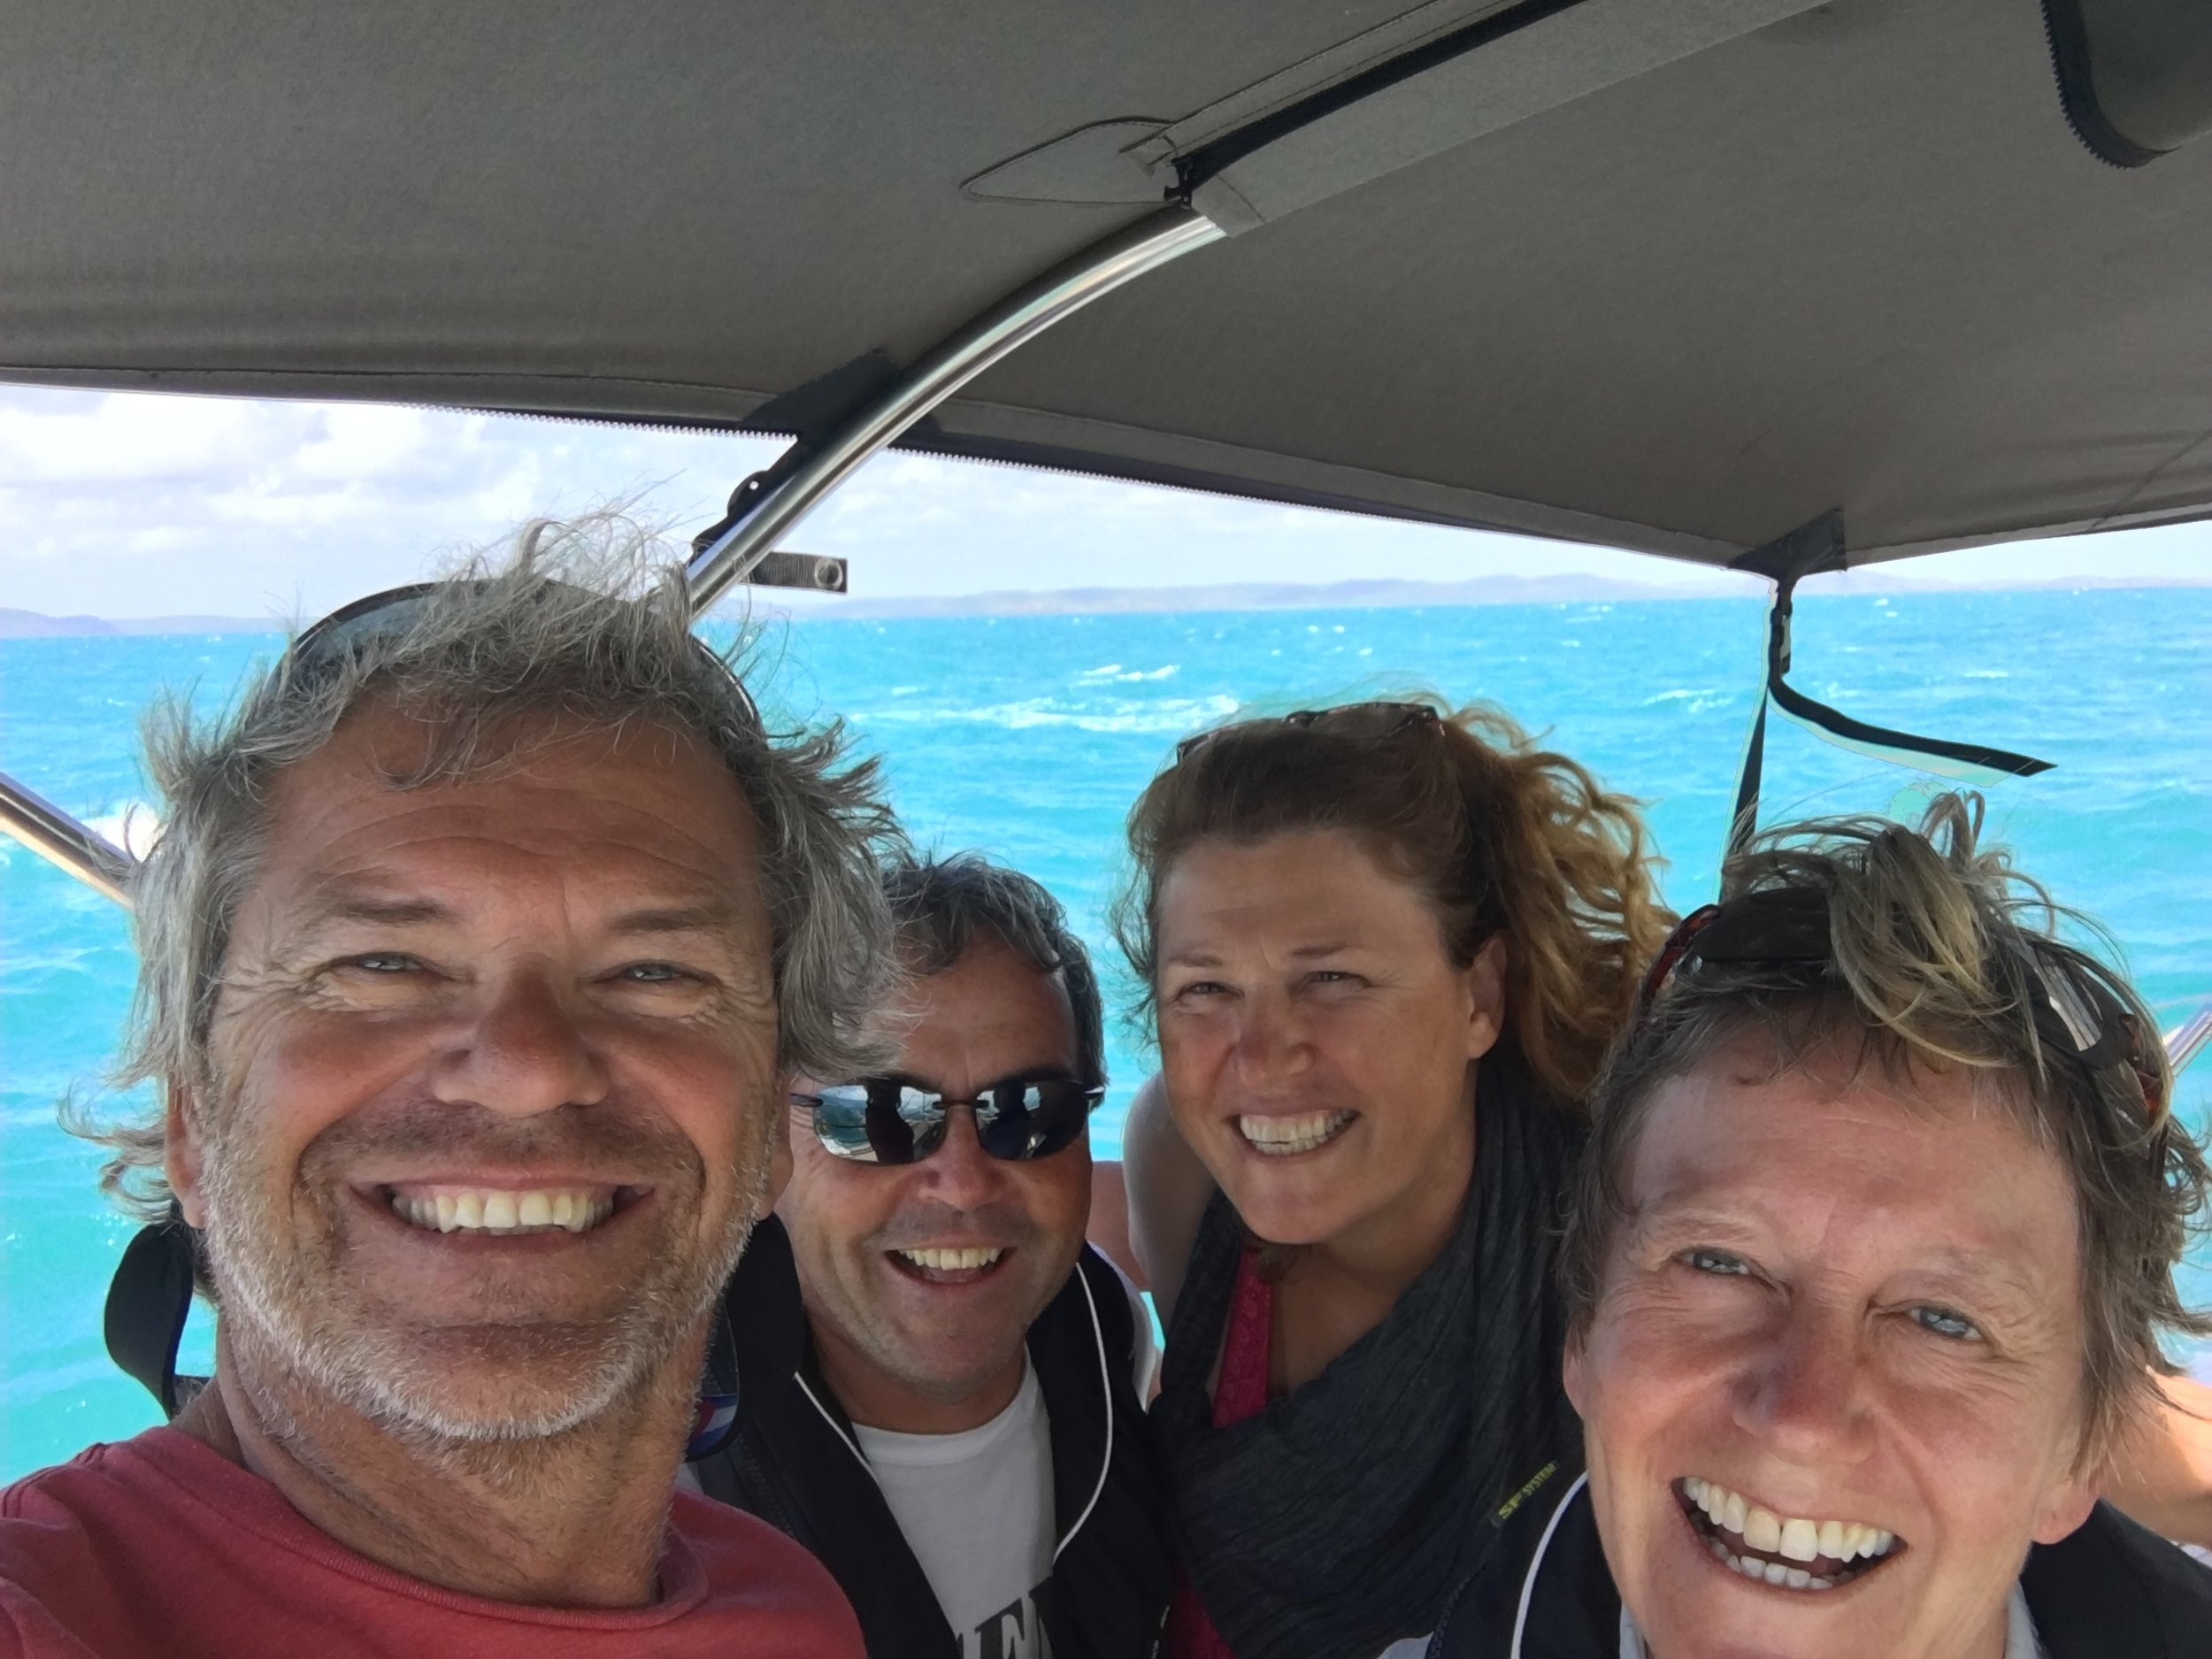 Celebratory photo at the top of Australia!